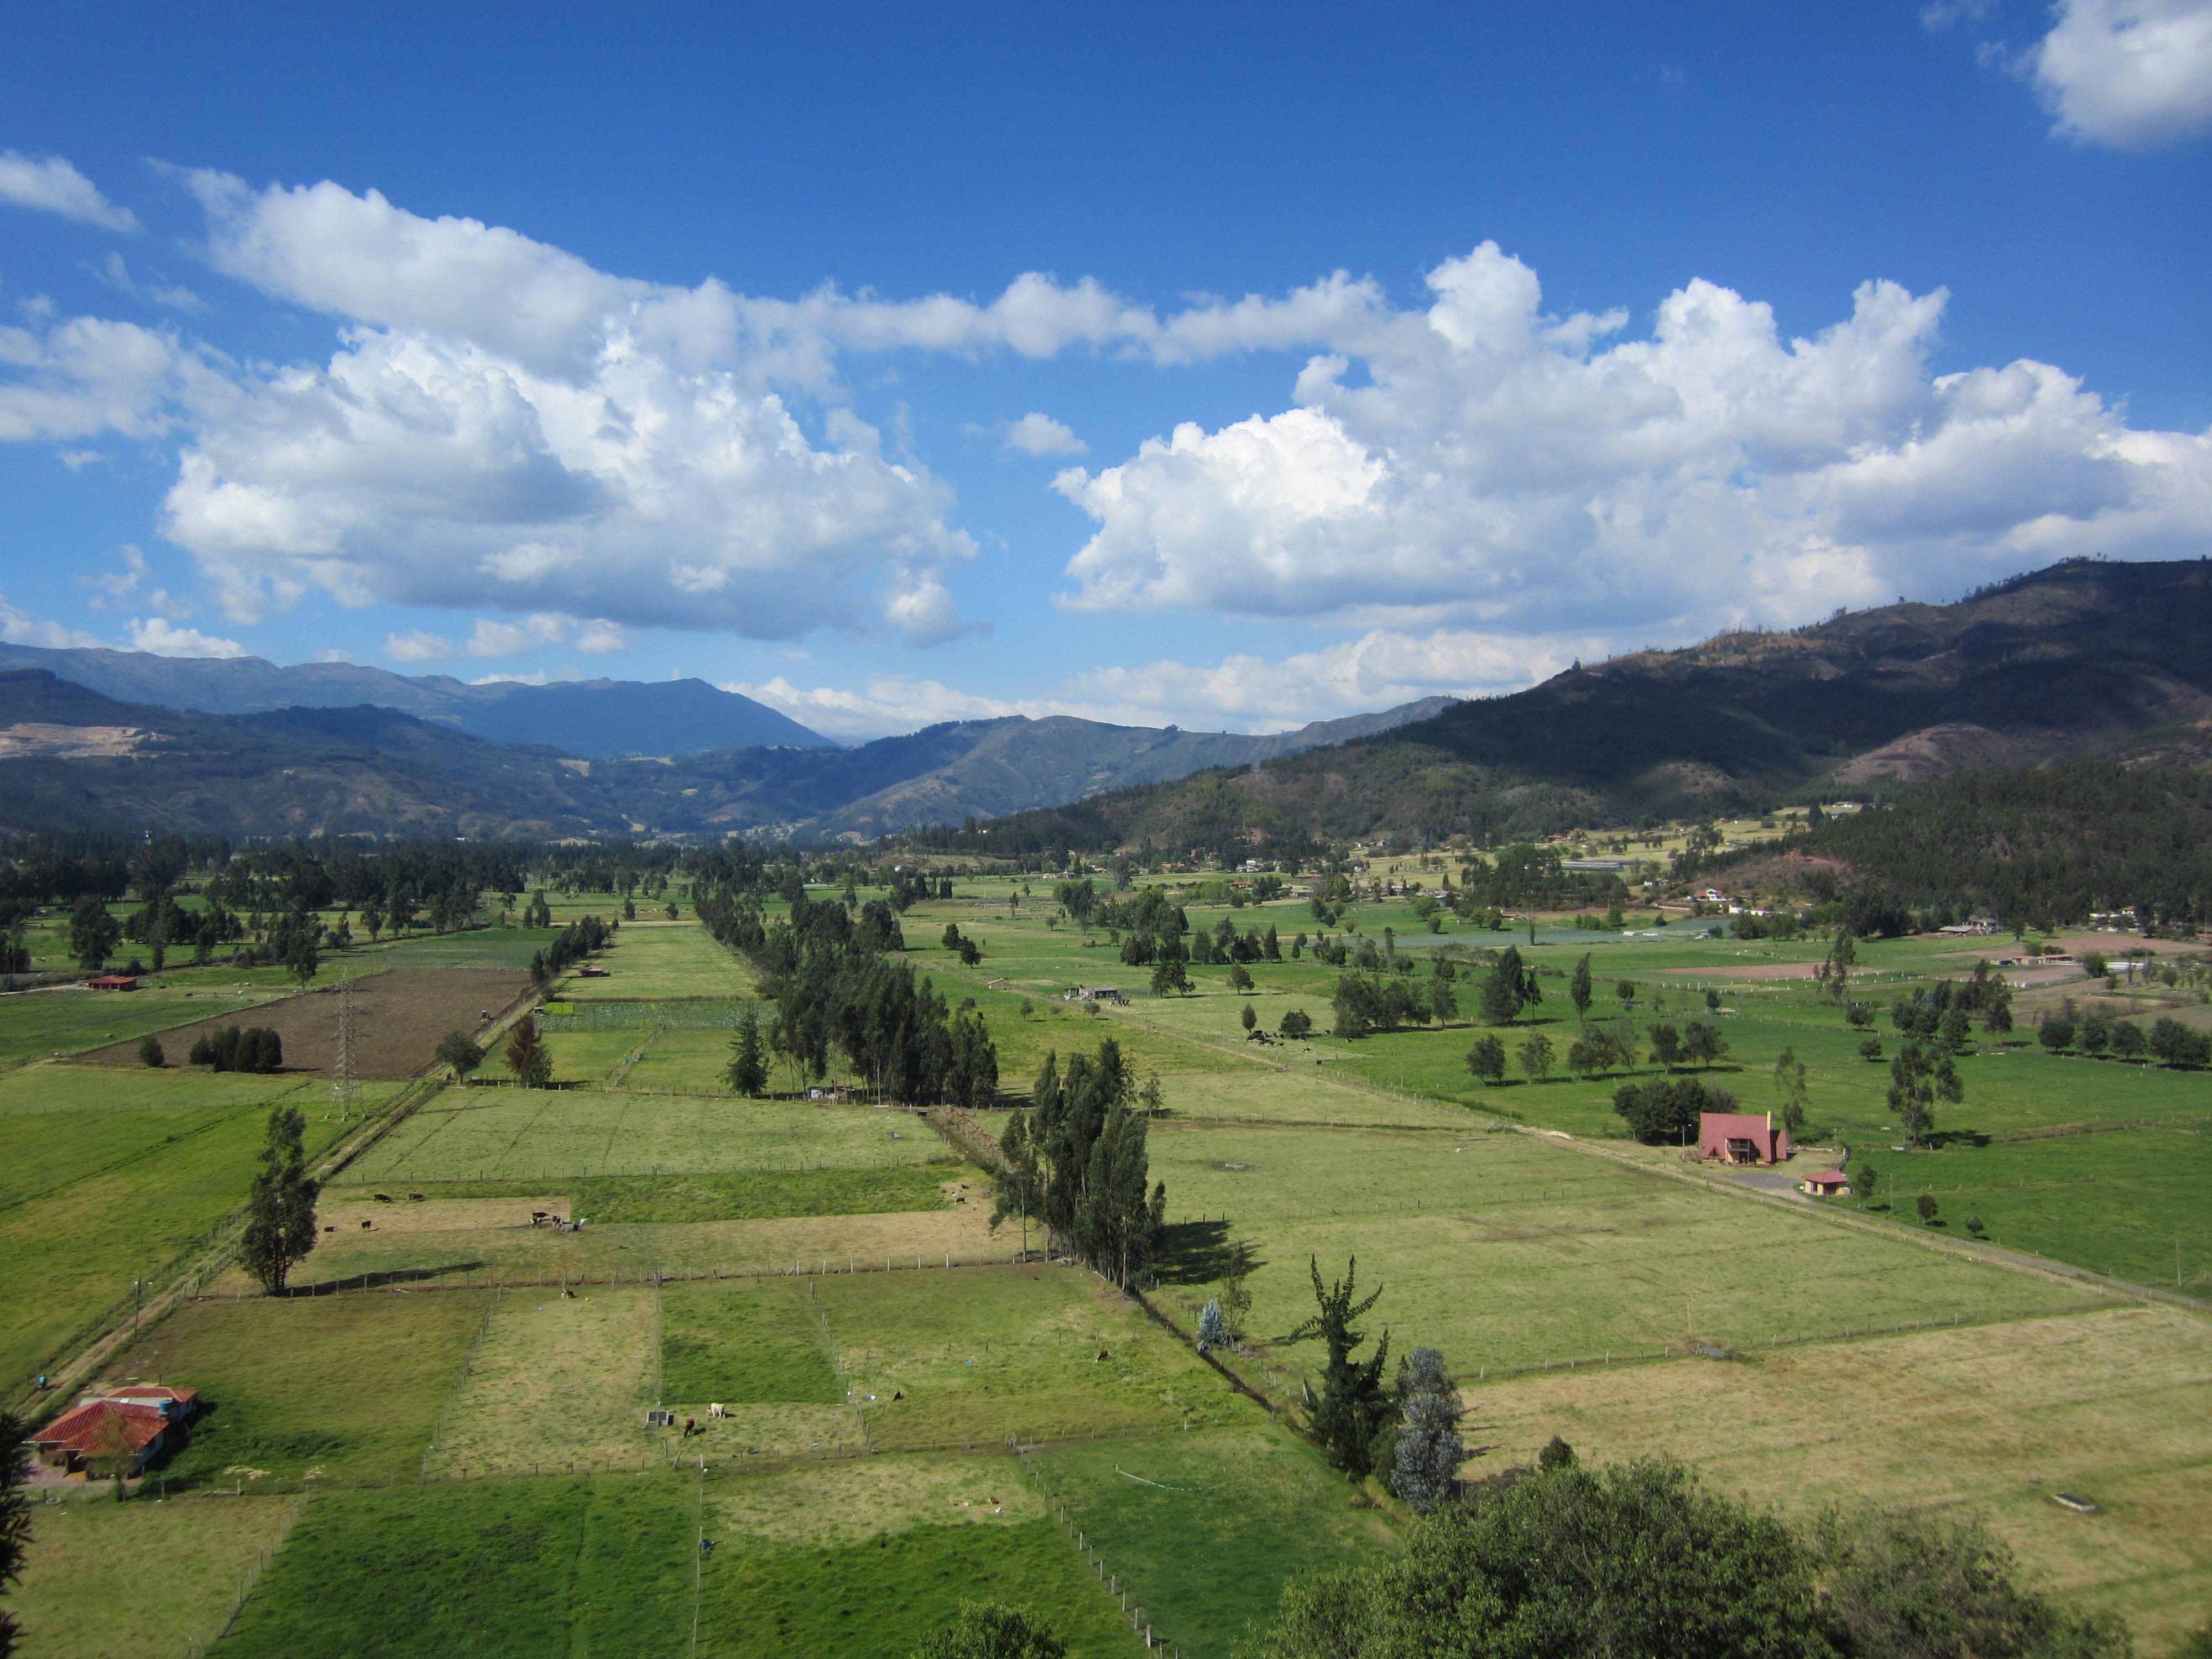 Gambar Pemandangan Horison Gunung Langit Bidang Tanah